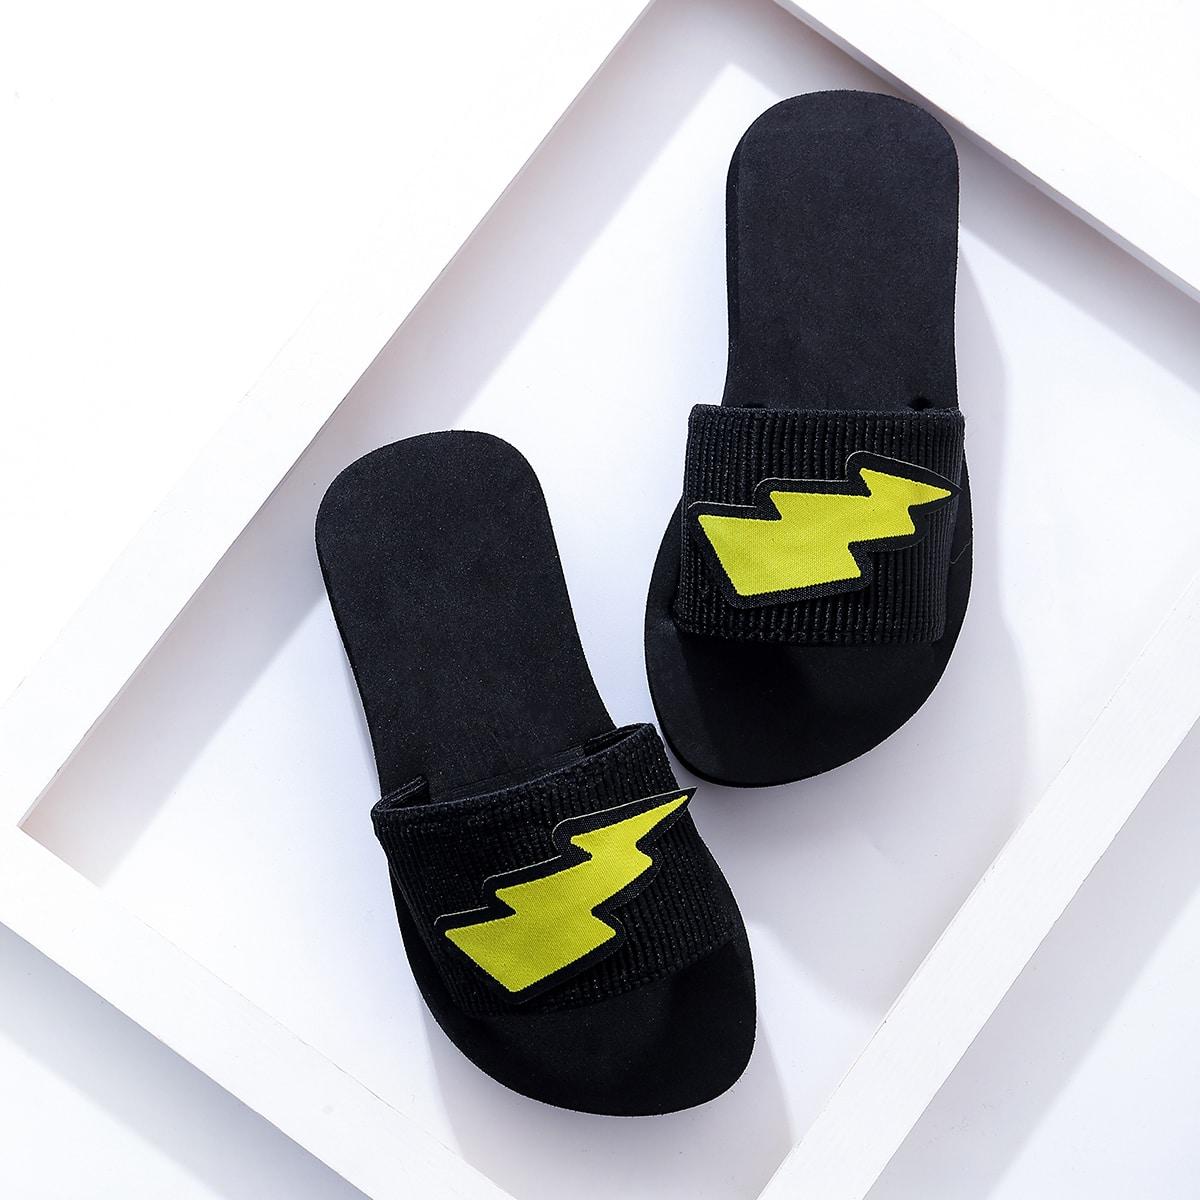 SHEIN / Toddler Boys Lightning Bolt Patch Slippers